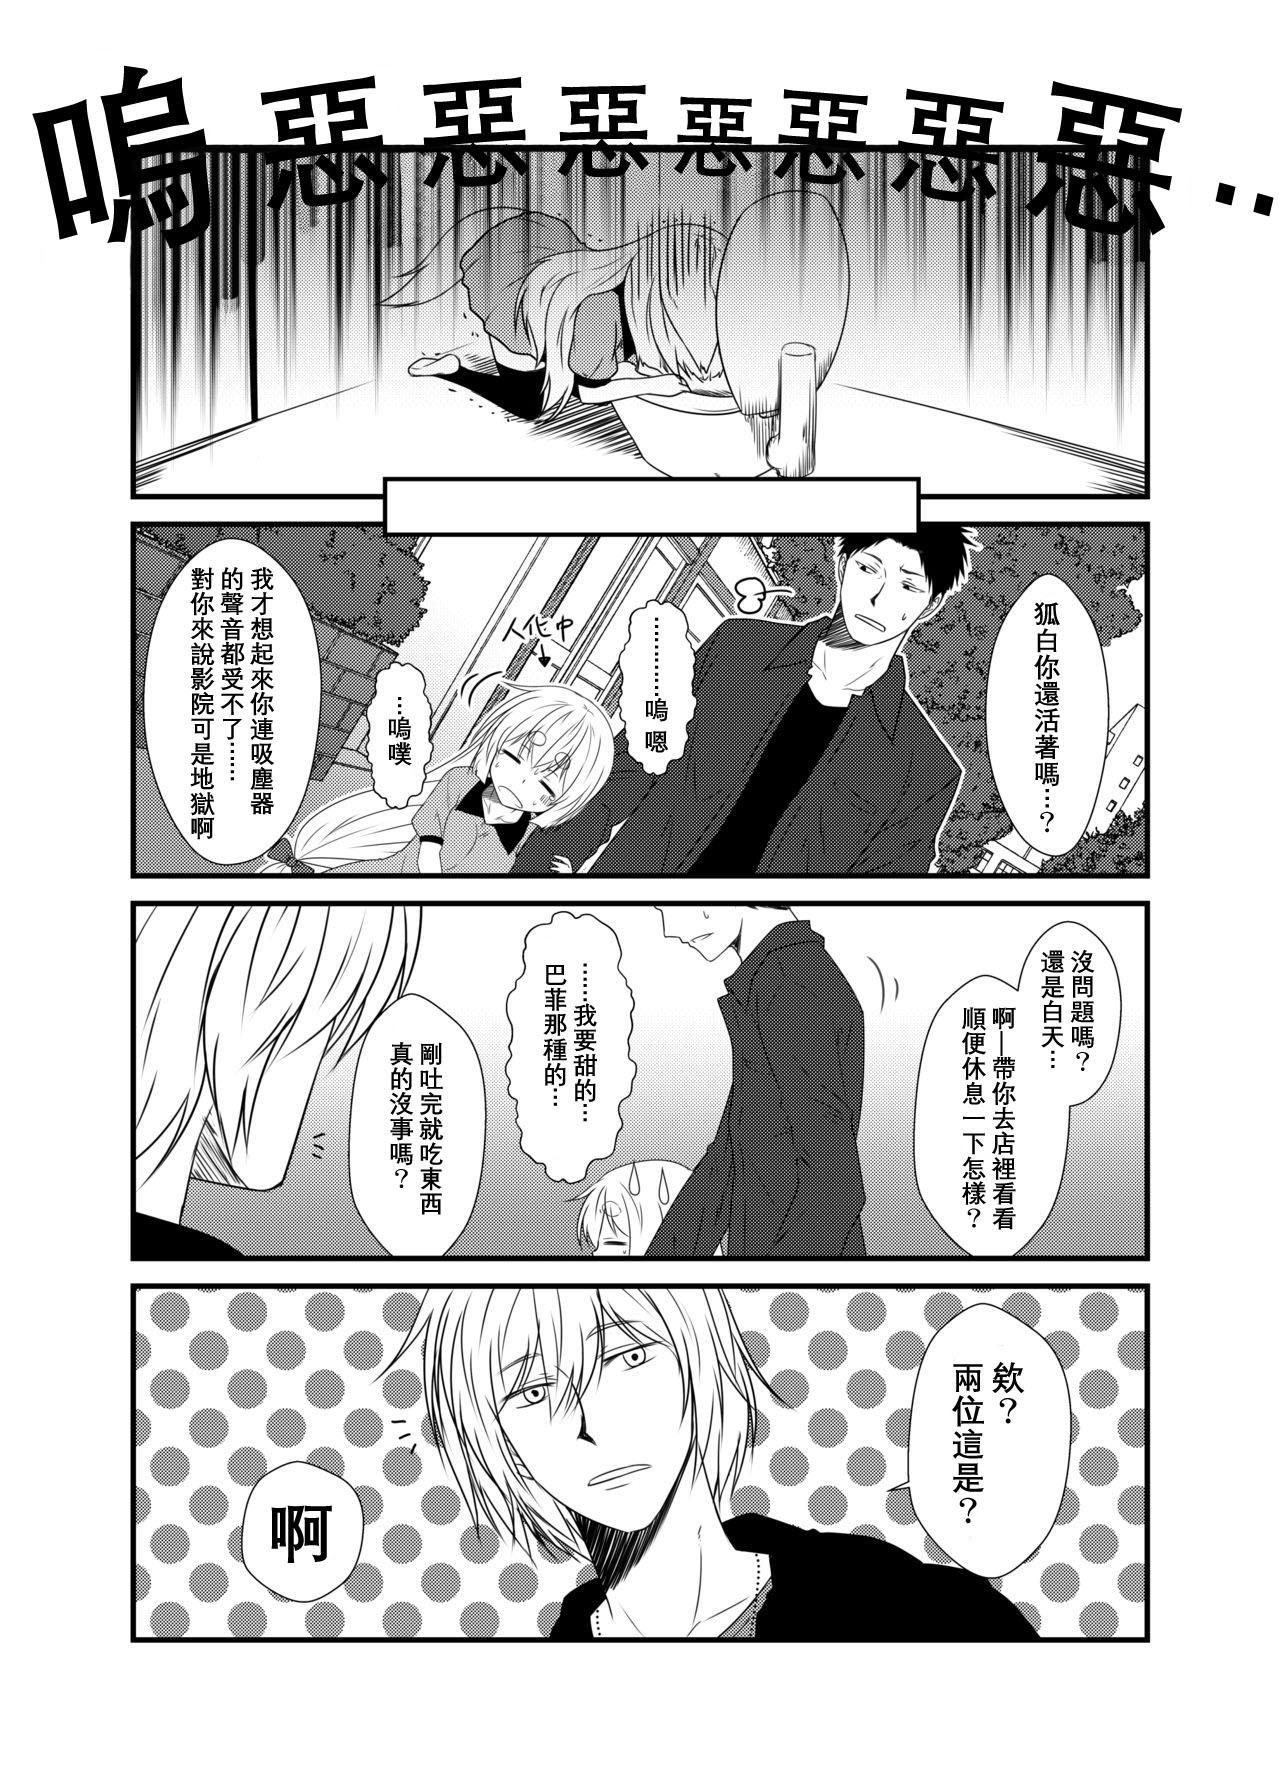 Kohaku Biyori Vol. 5 10